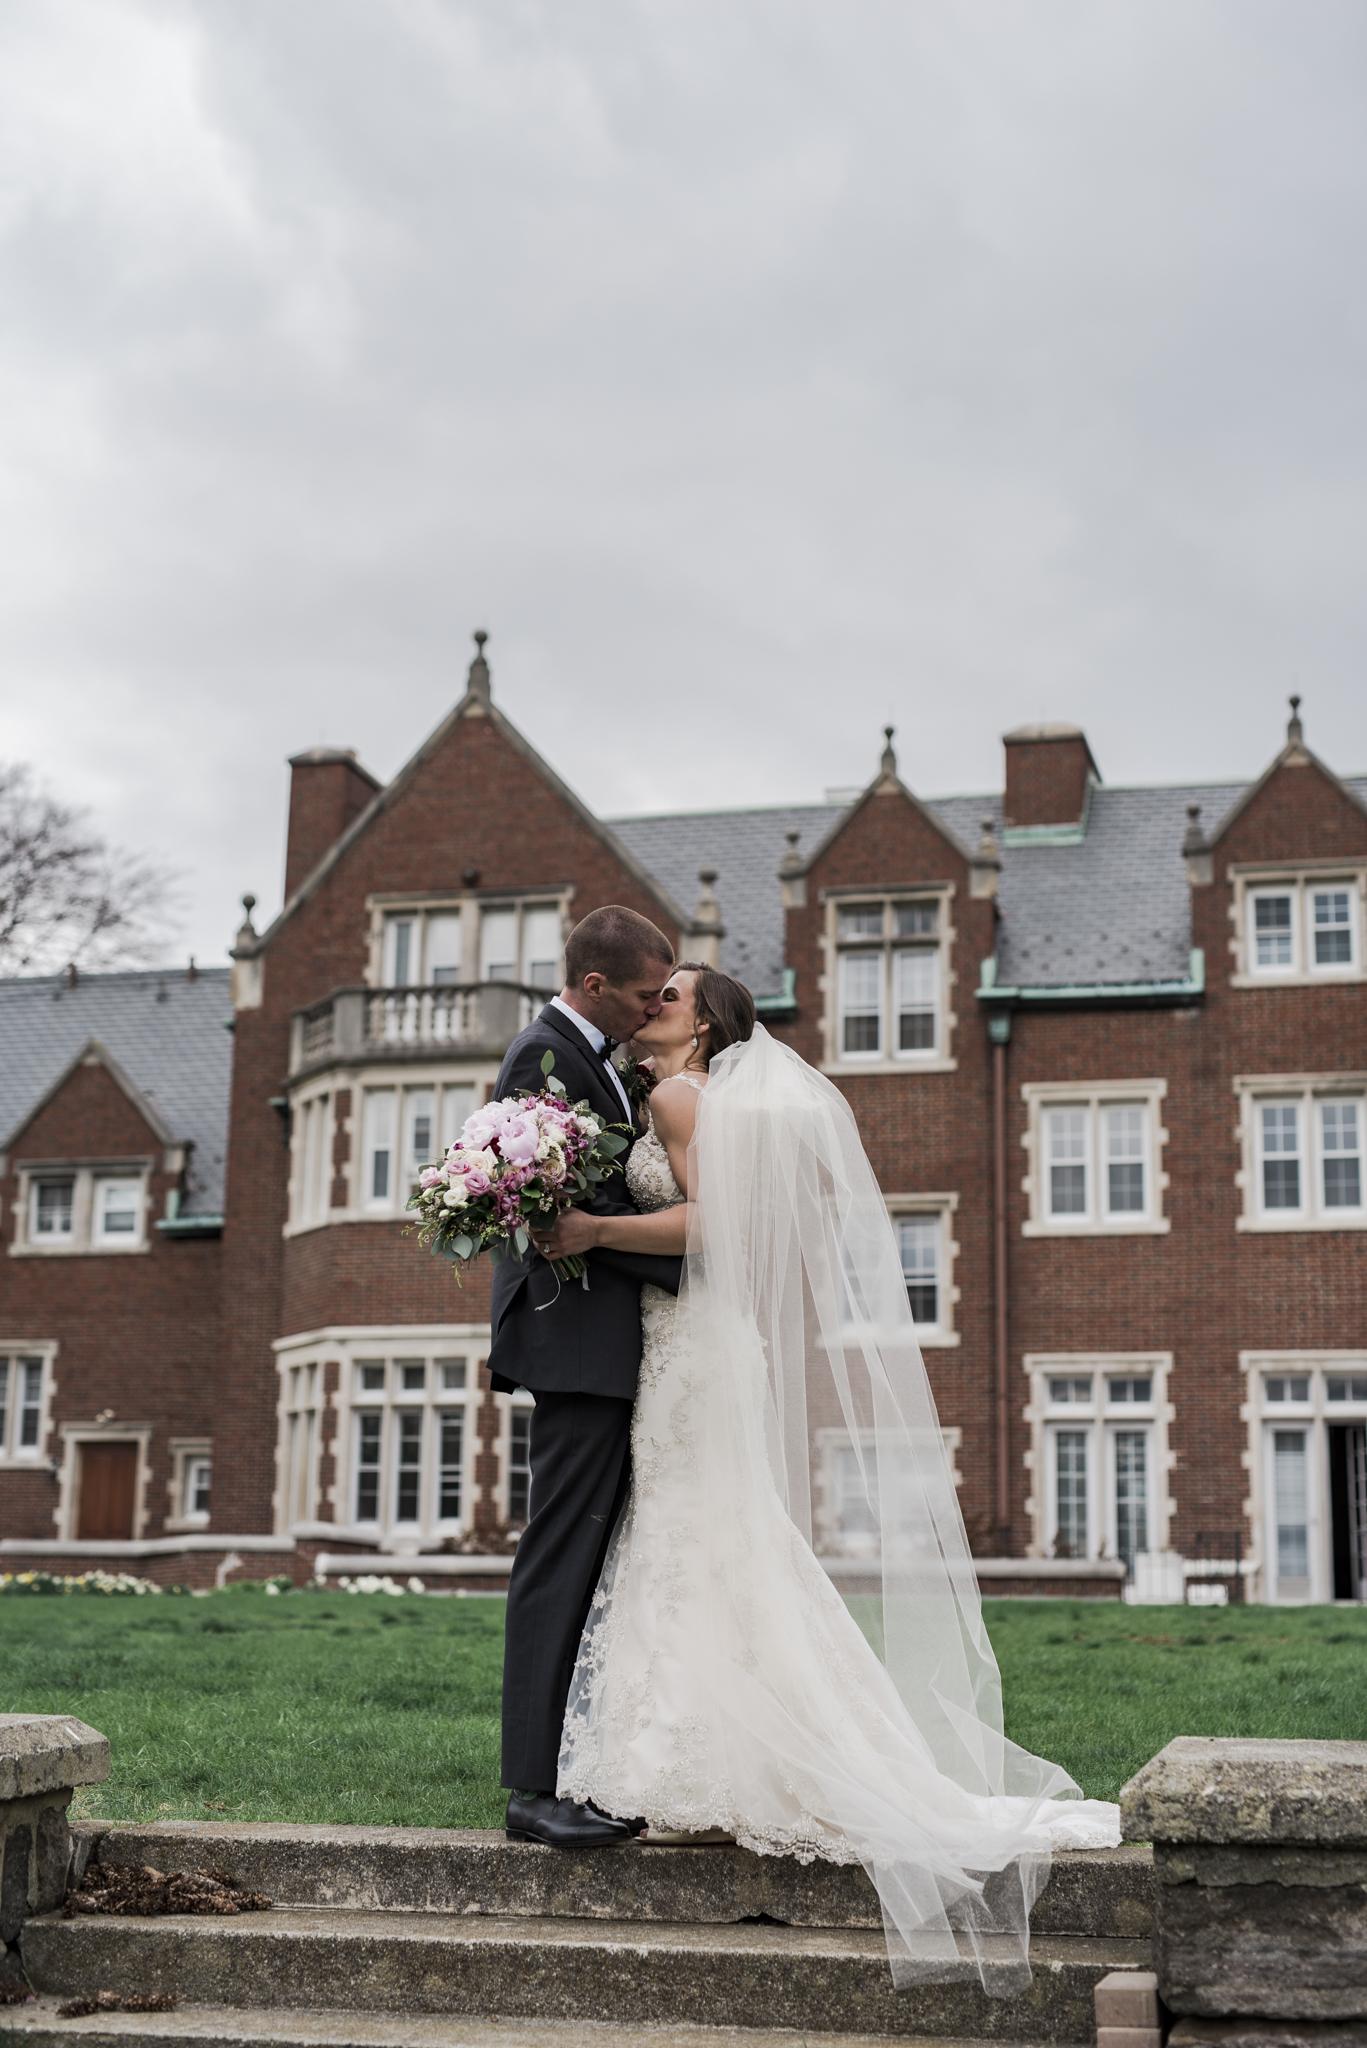 NJ Wedding Photographer (4 of 6).jpg